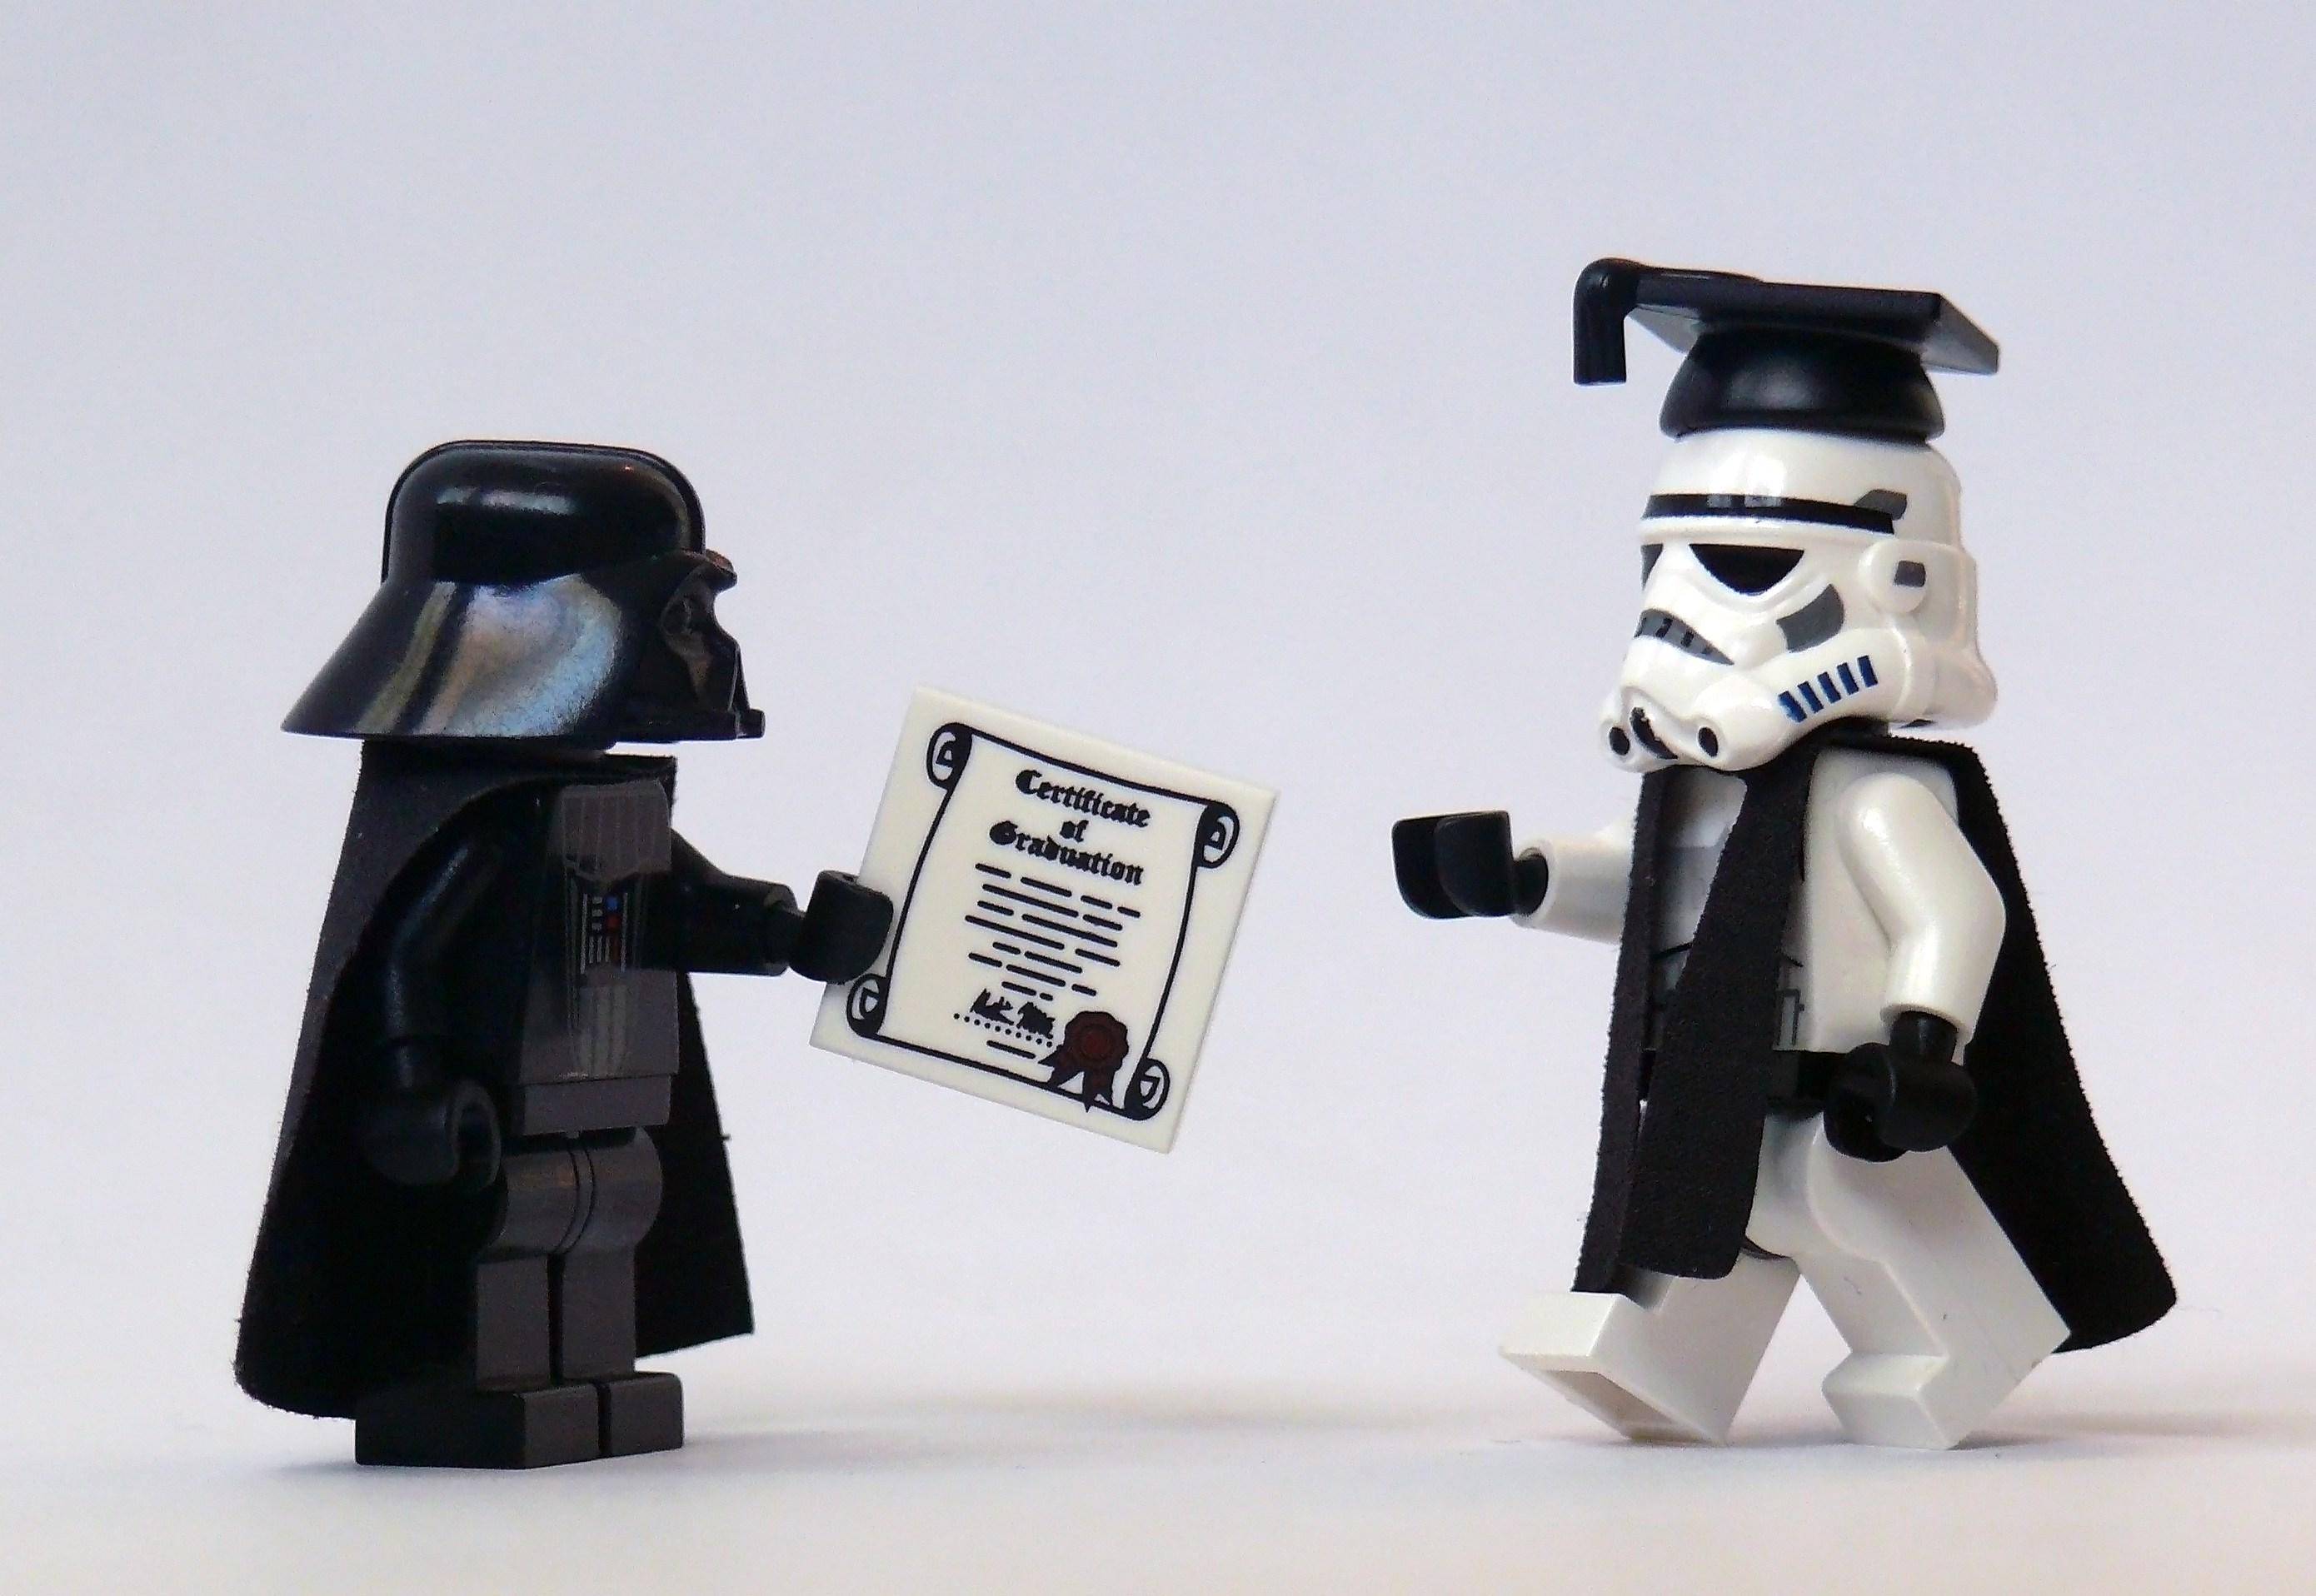 files/images/degree-stormtrooper.jpg